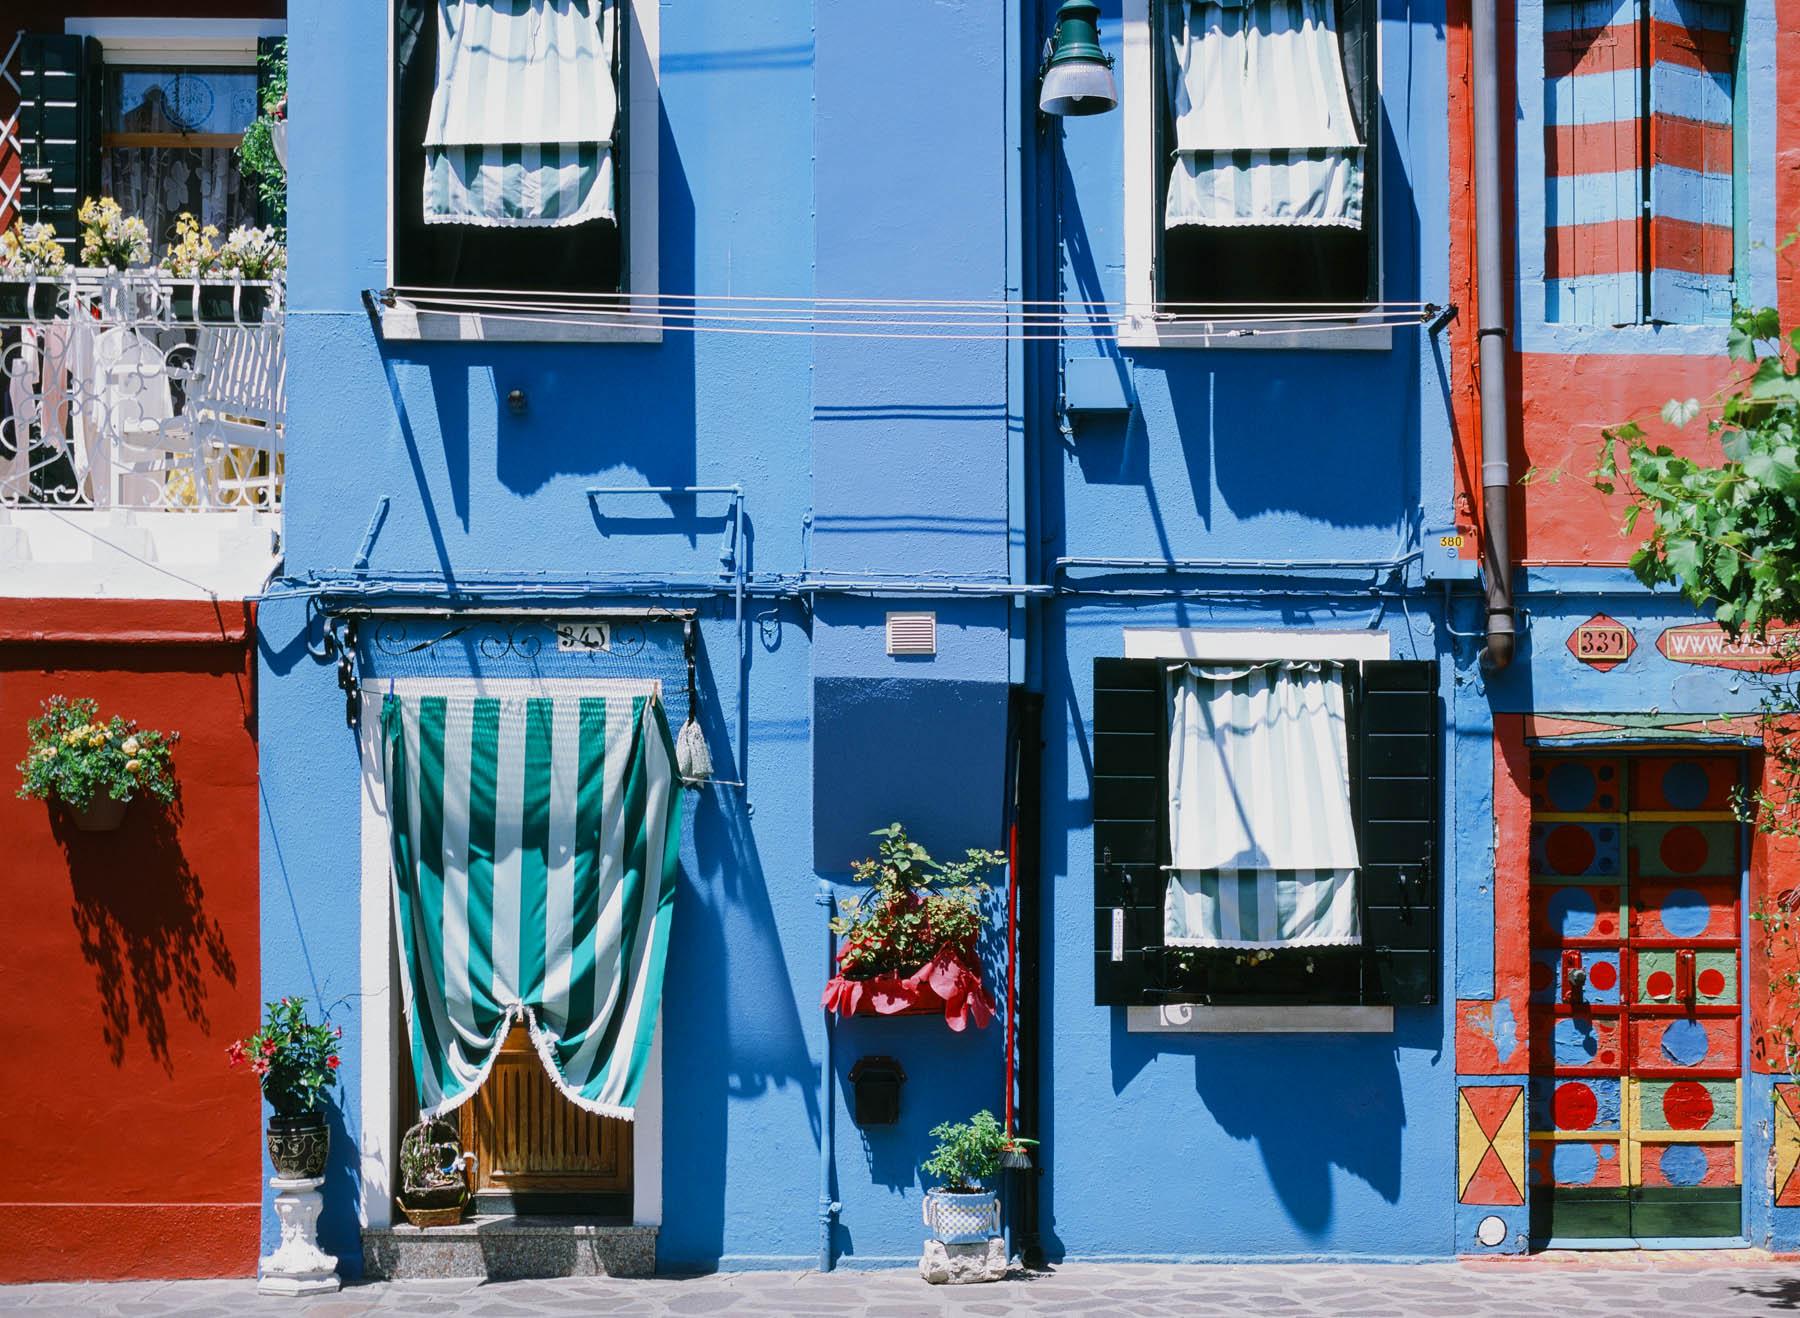 Beautiful Burano | Pentax 645n | Provia 100